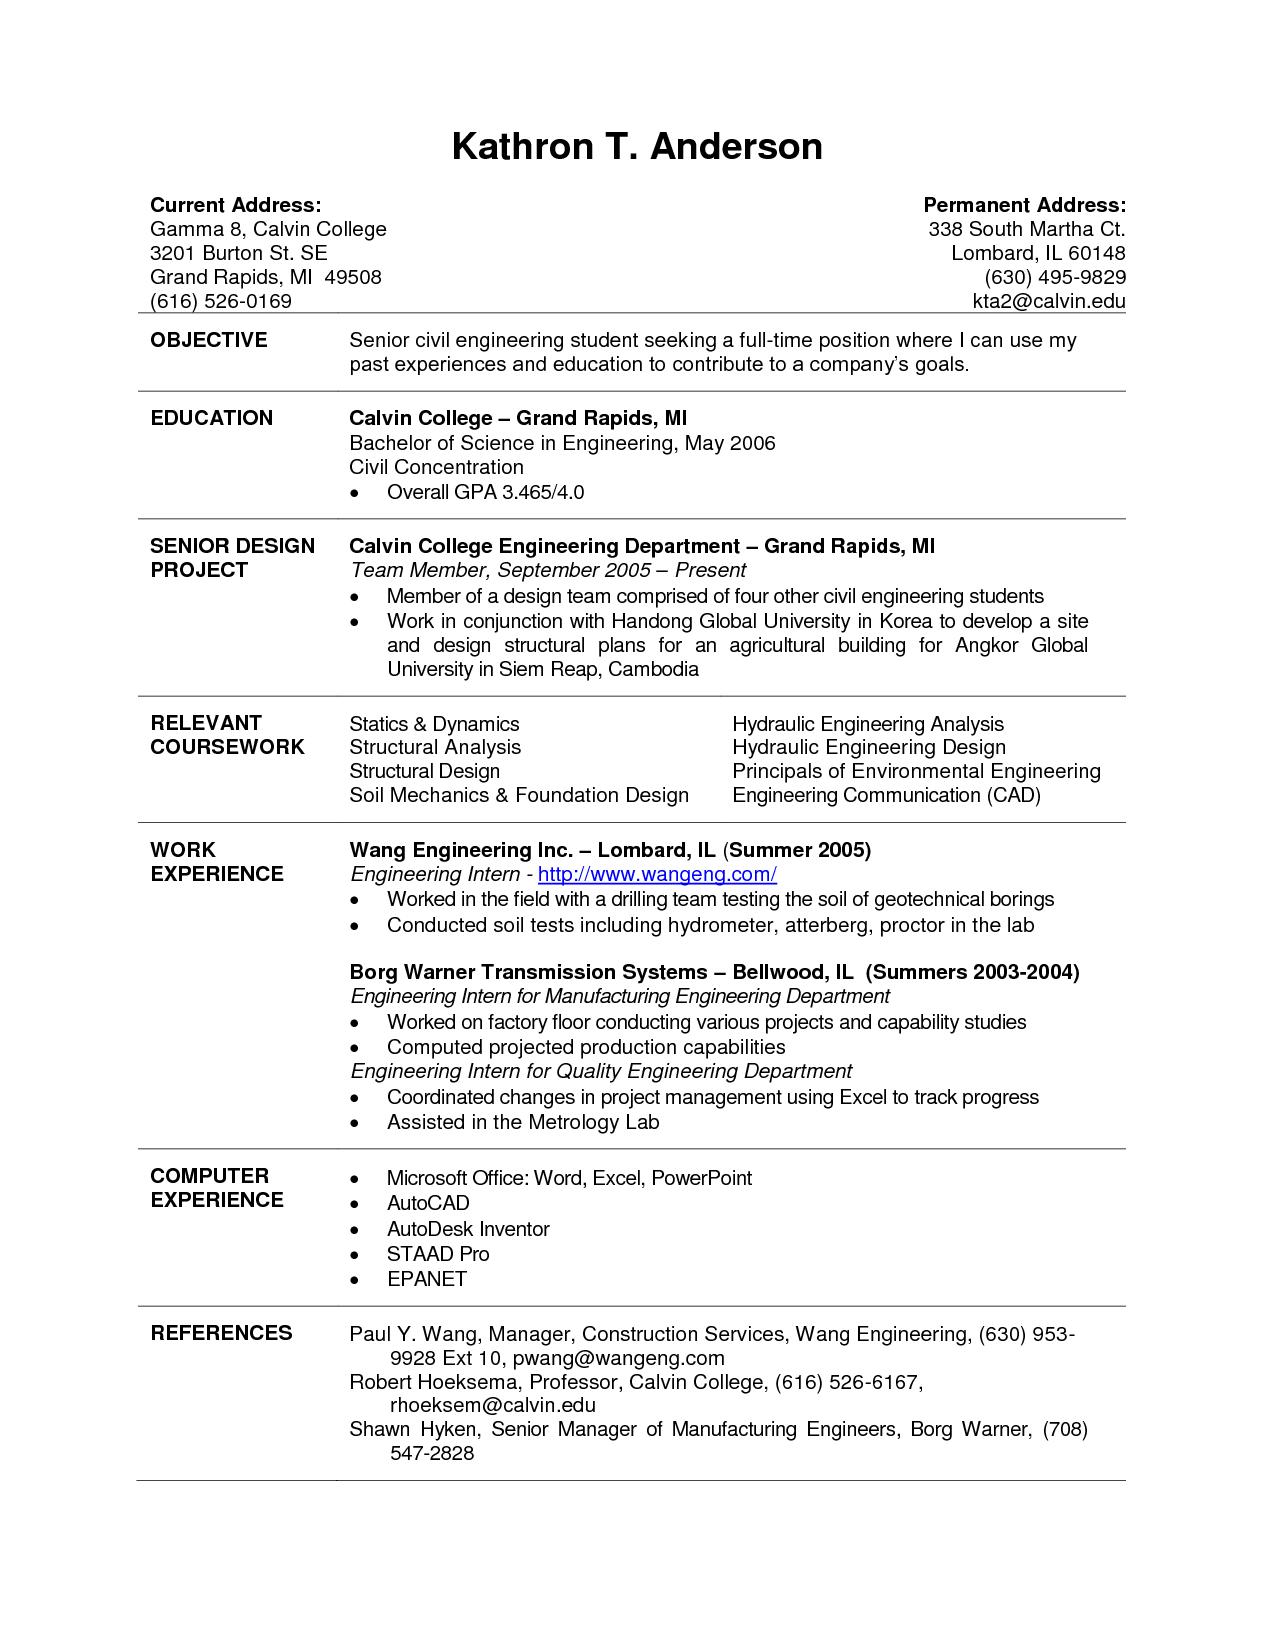 Current College Student Resume